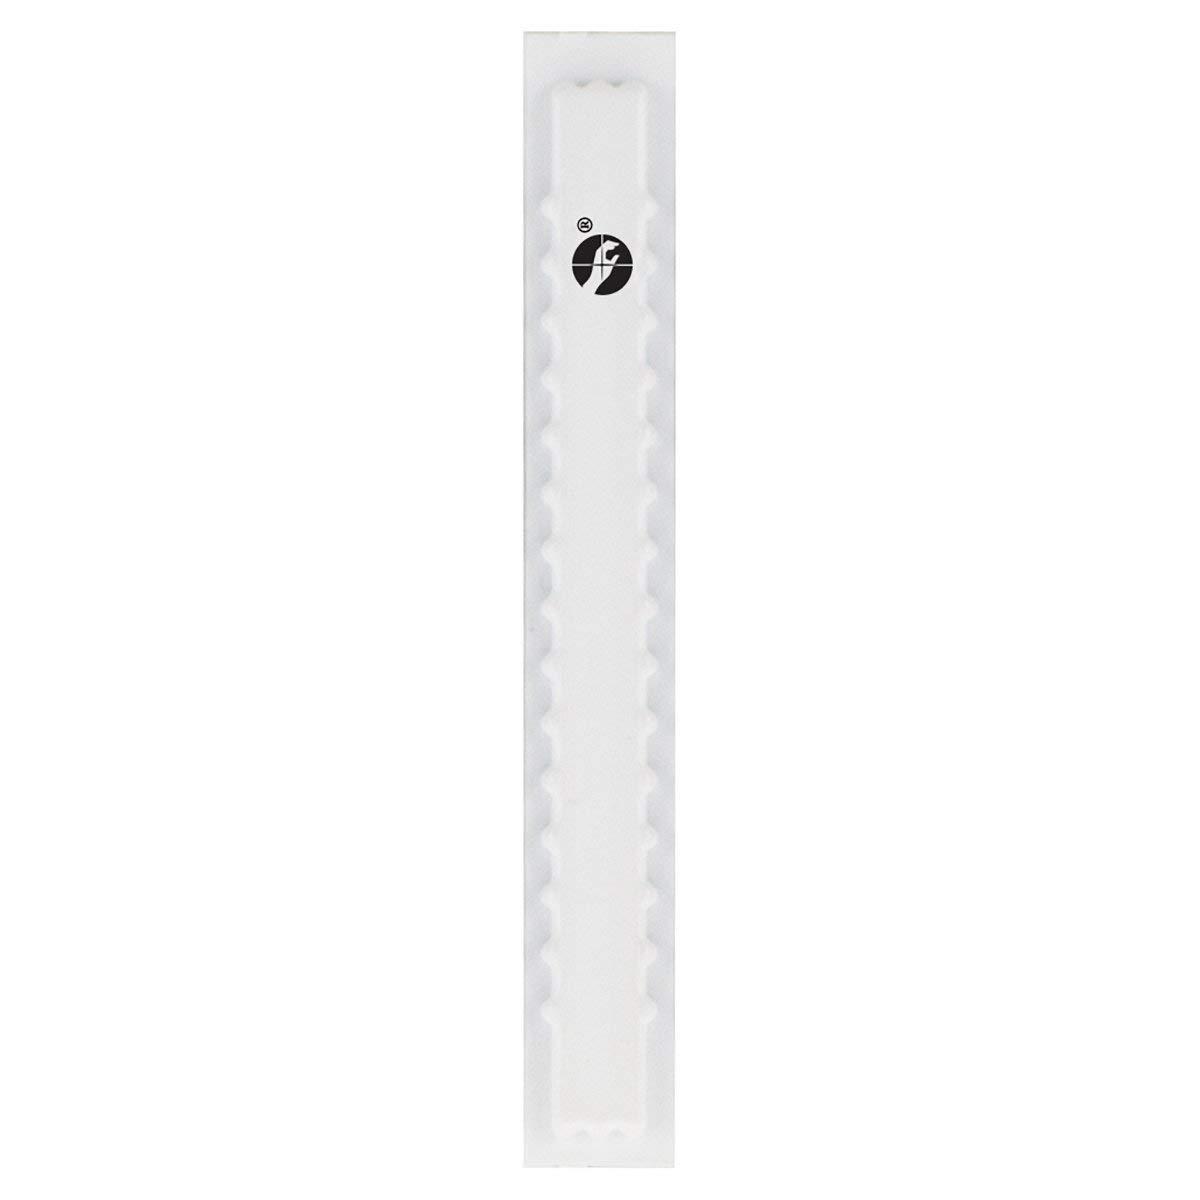 Cheap Zldrs1 Sensormatic Soft Label, find Zldrs1 Sensormatic